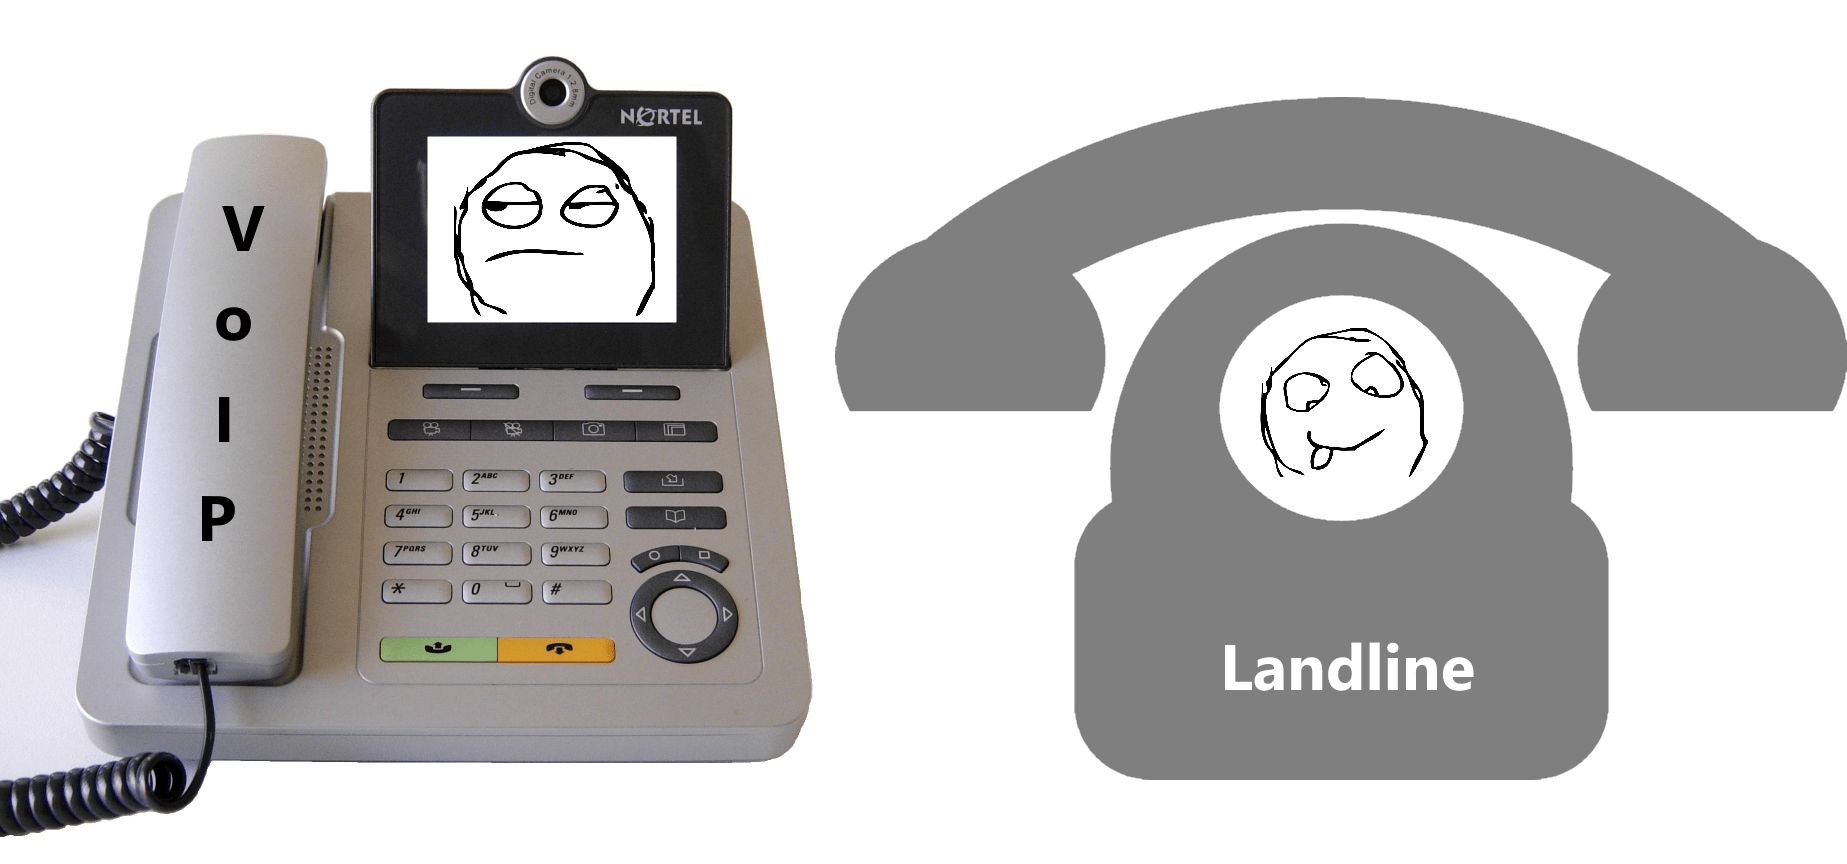 Home Security System Landline vs VoIP